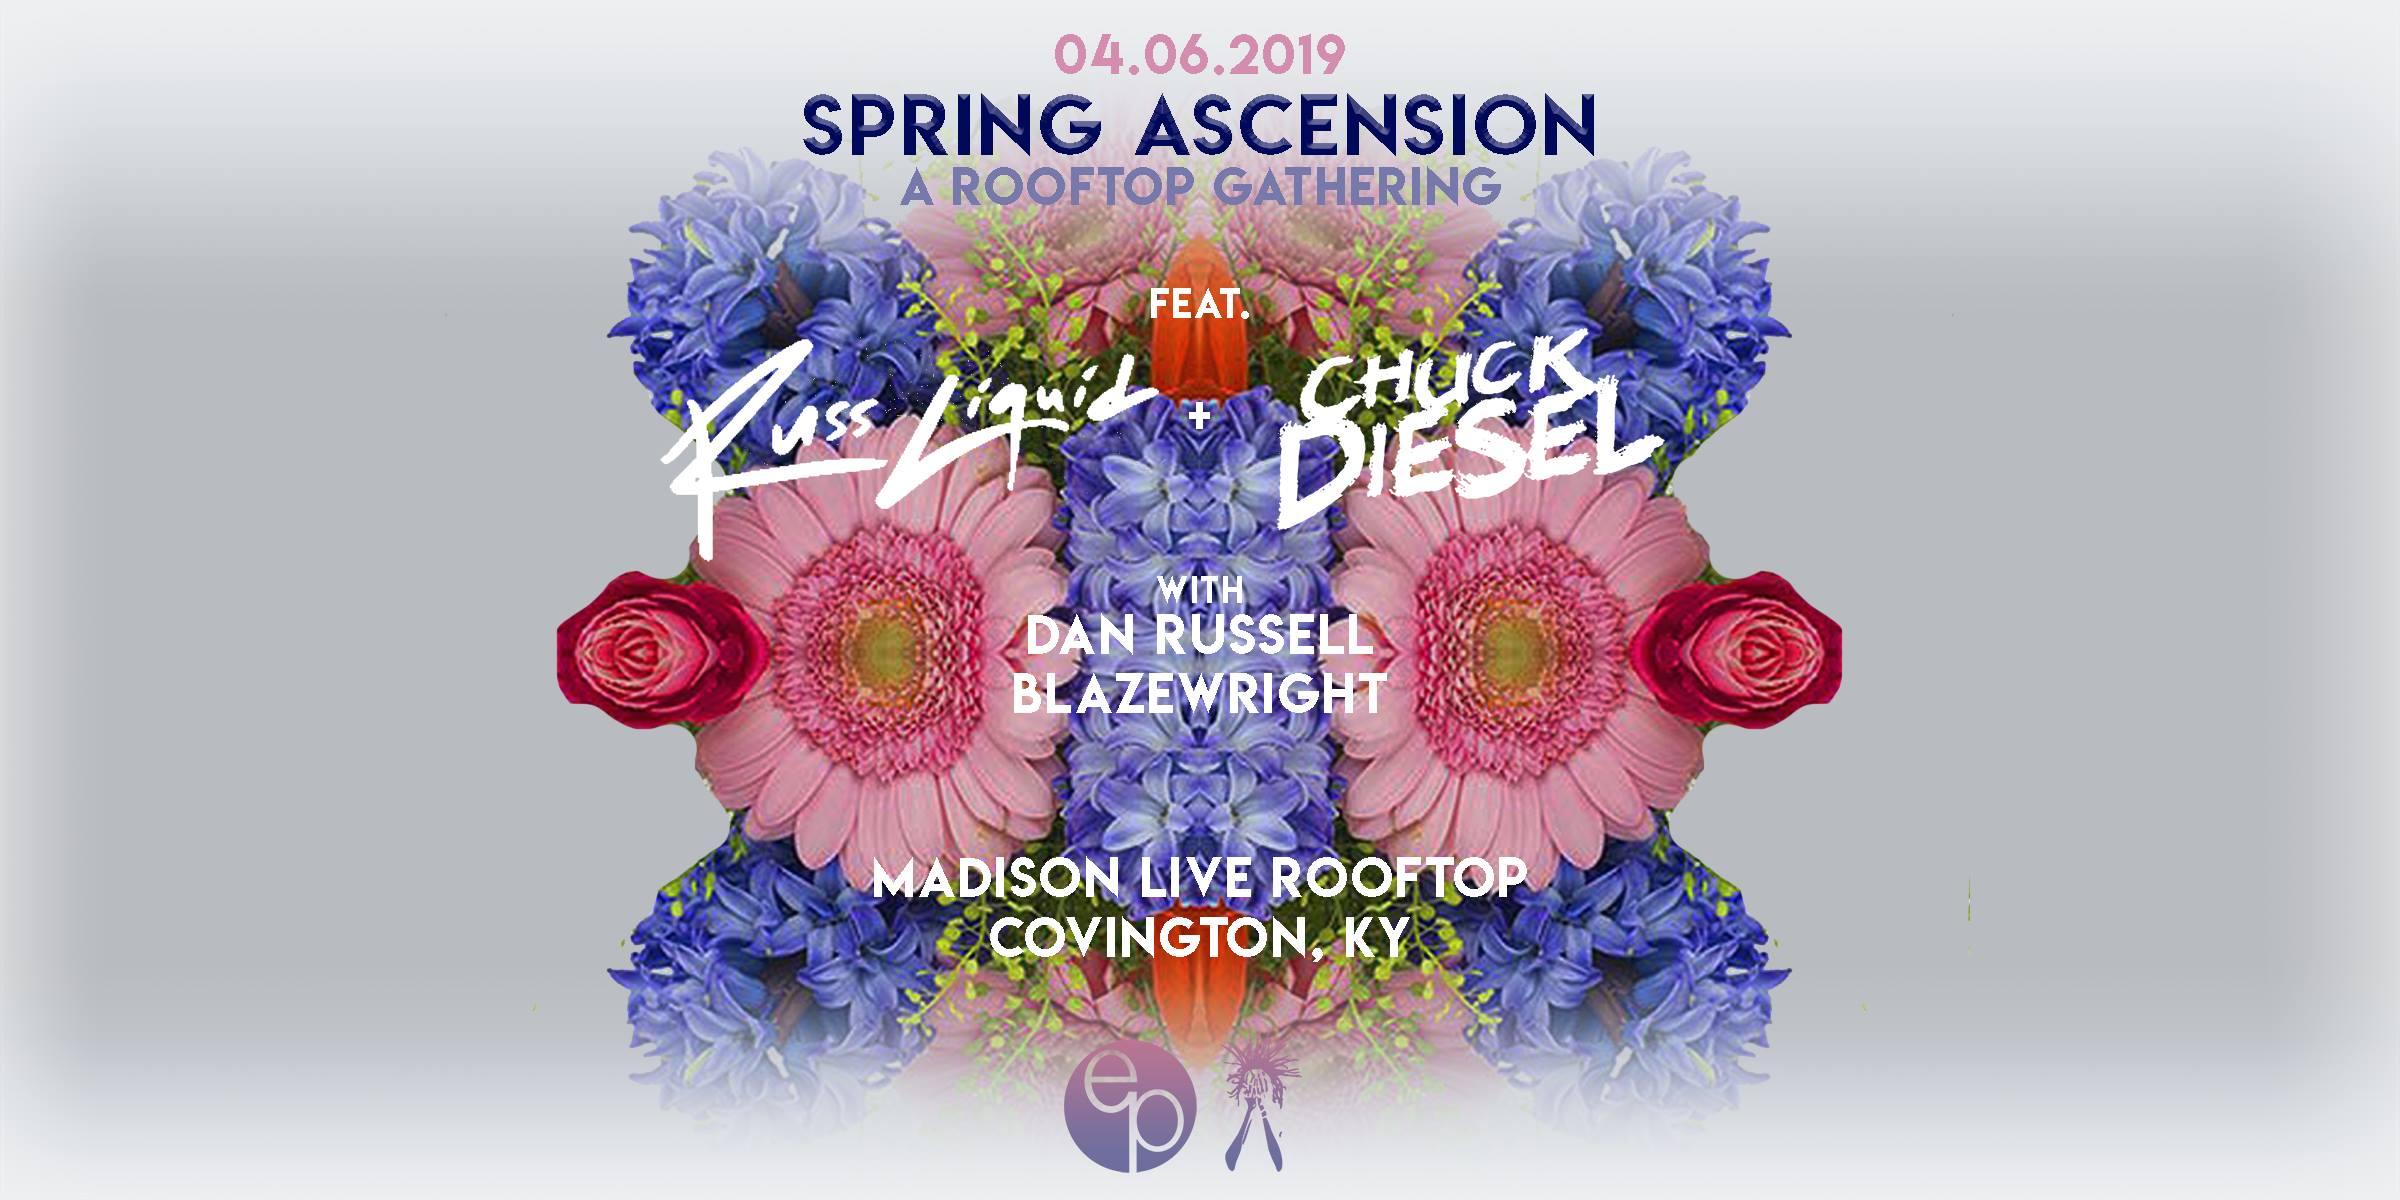 ChuckDiesel Spring Ascension.jpg